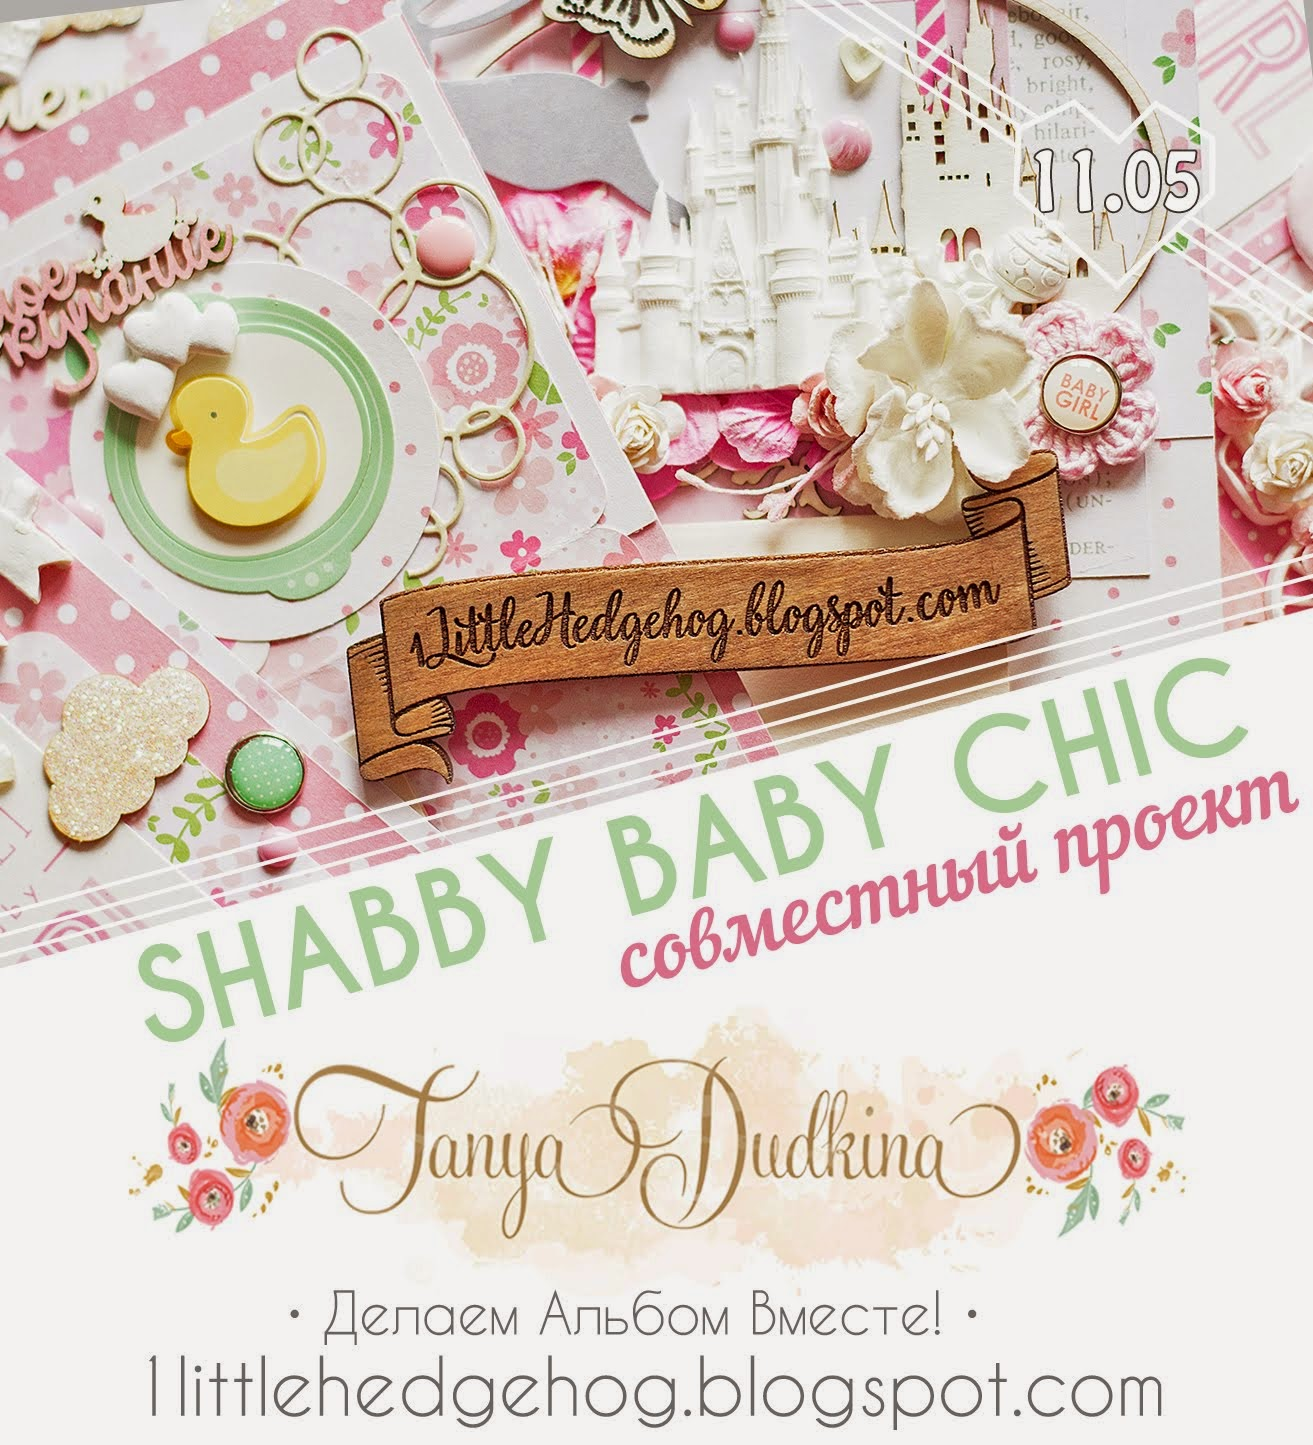 СП Shabby Baby Chic